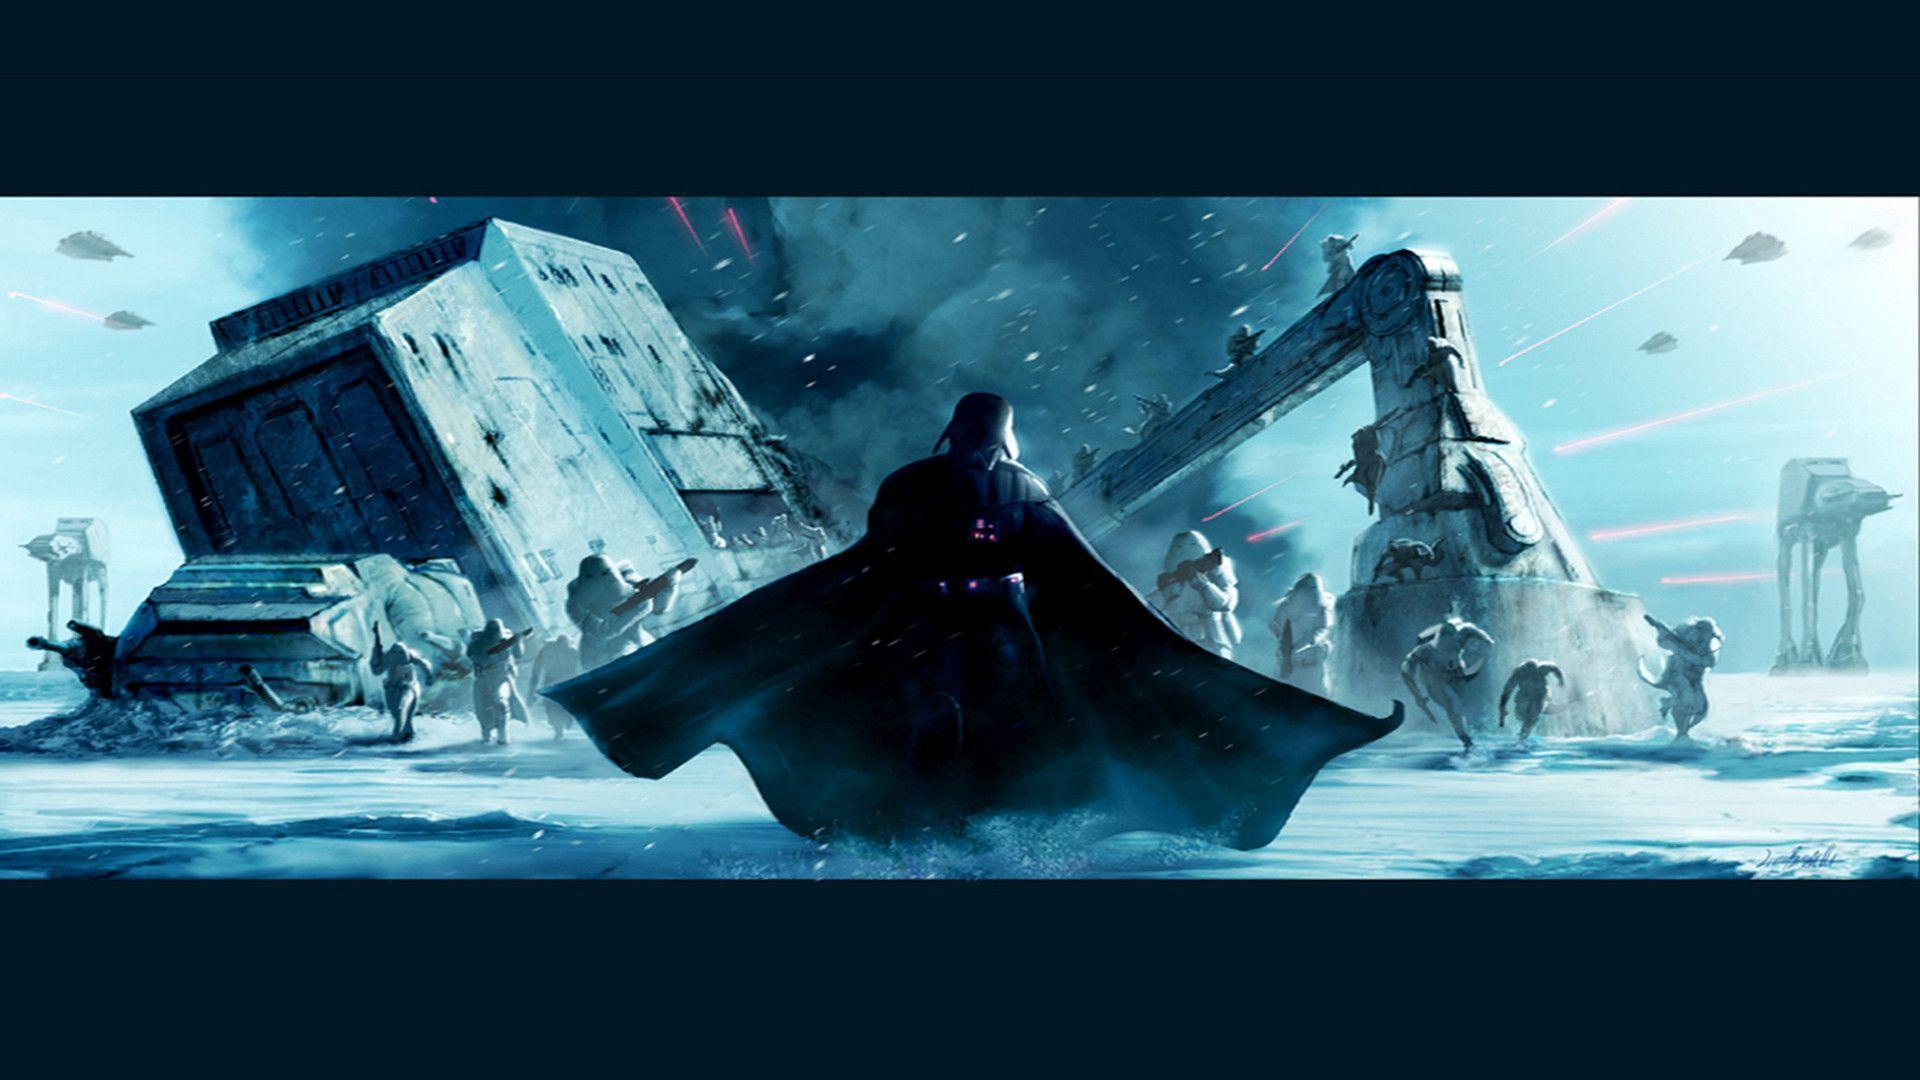 Star Wars Wallpapers, Star Wars Saga Wallpapers Star - Star Wars High Resolution , HD Wallpaper & Backgrounds